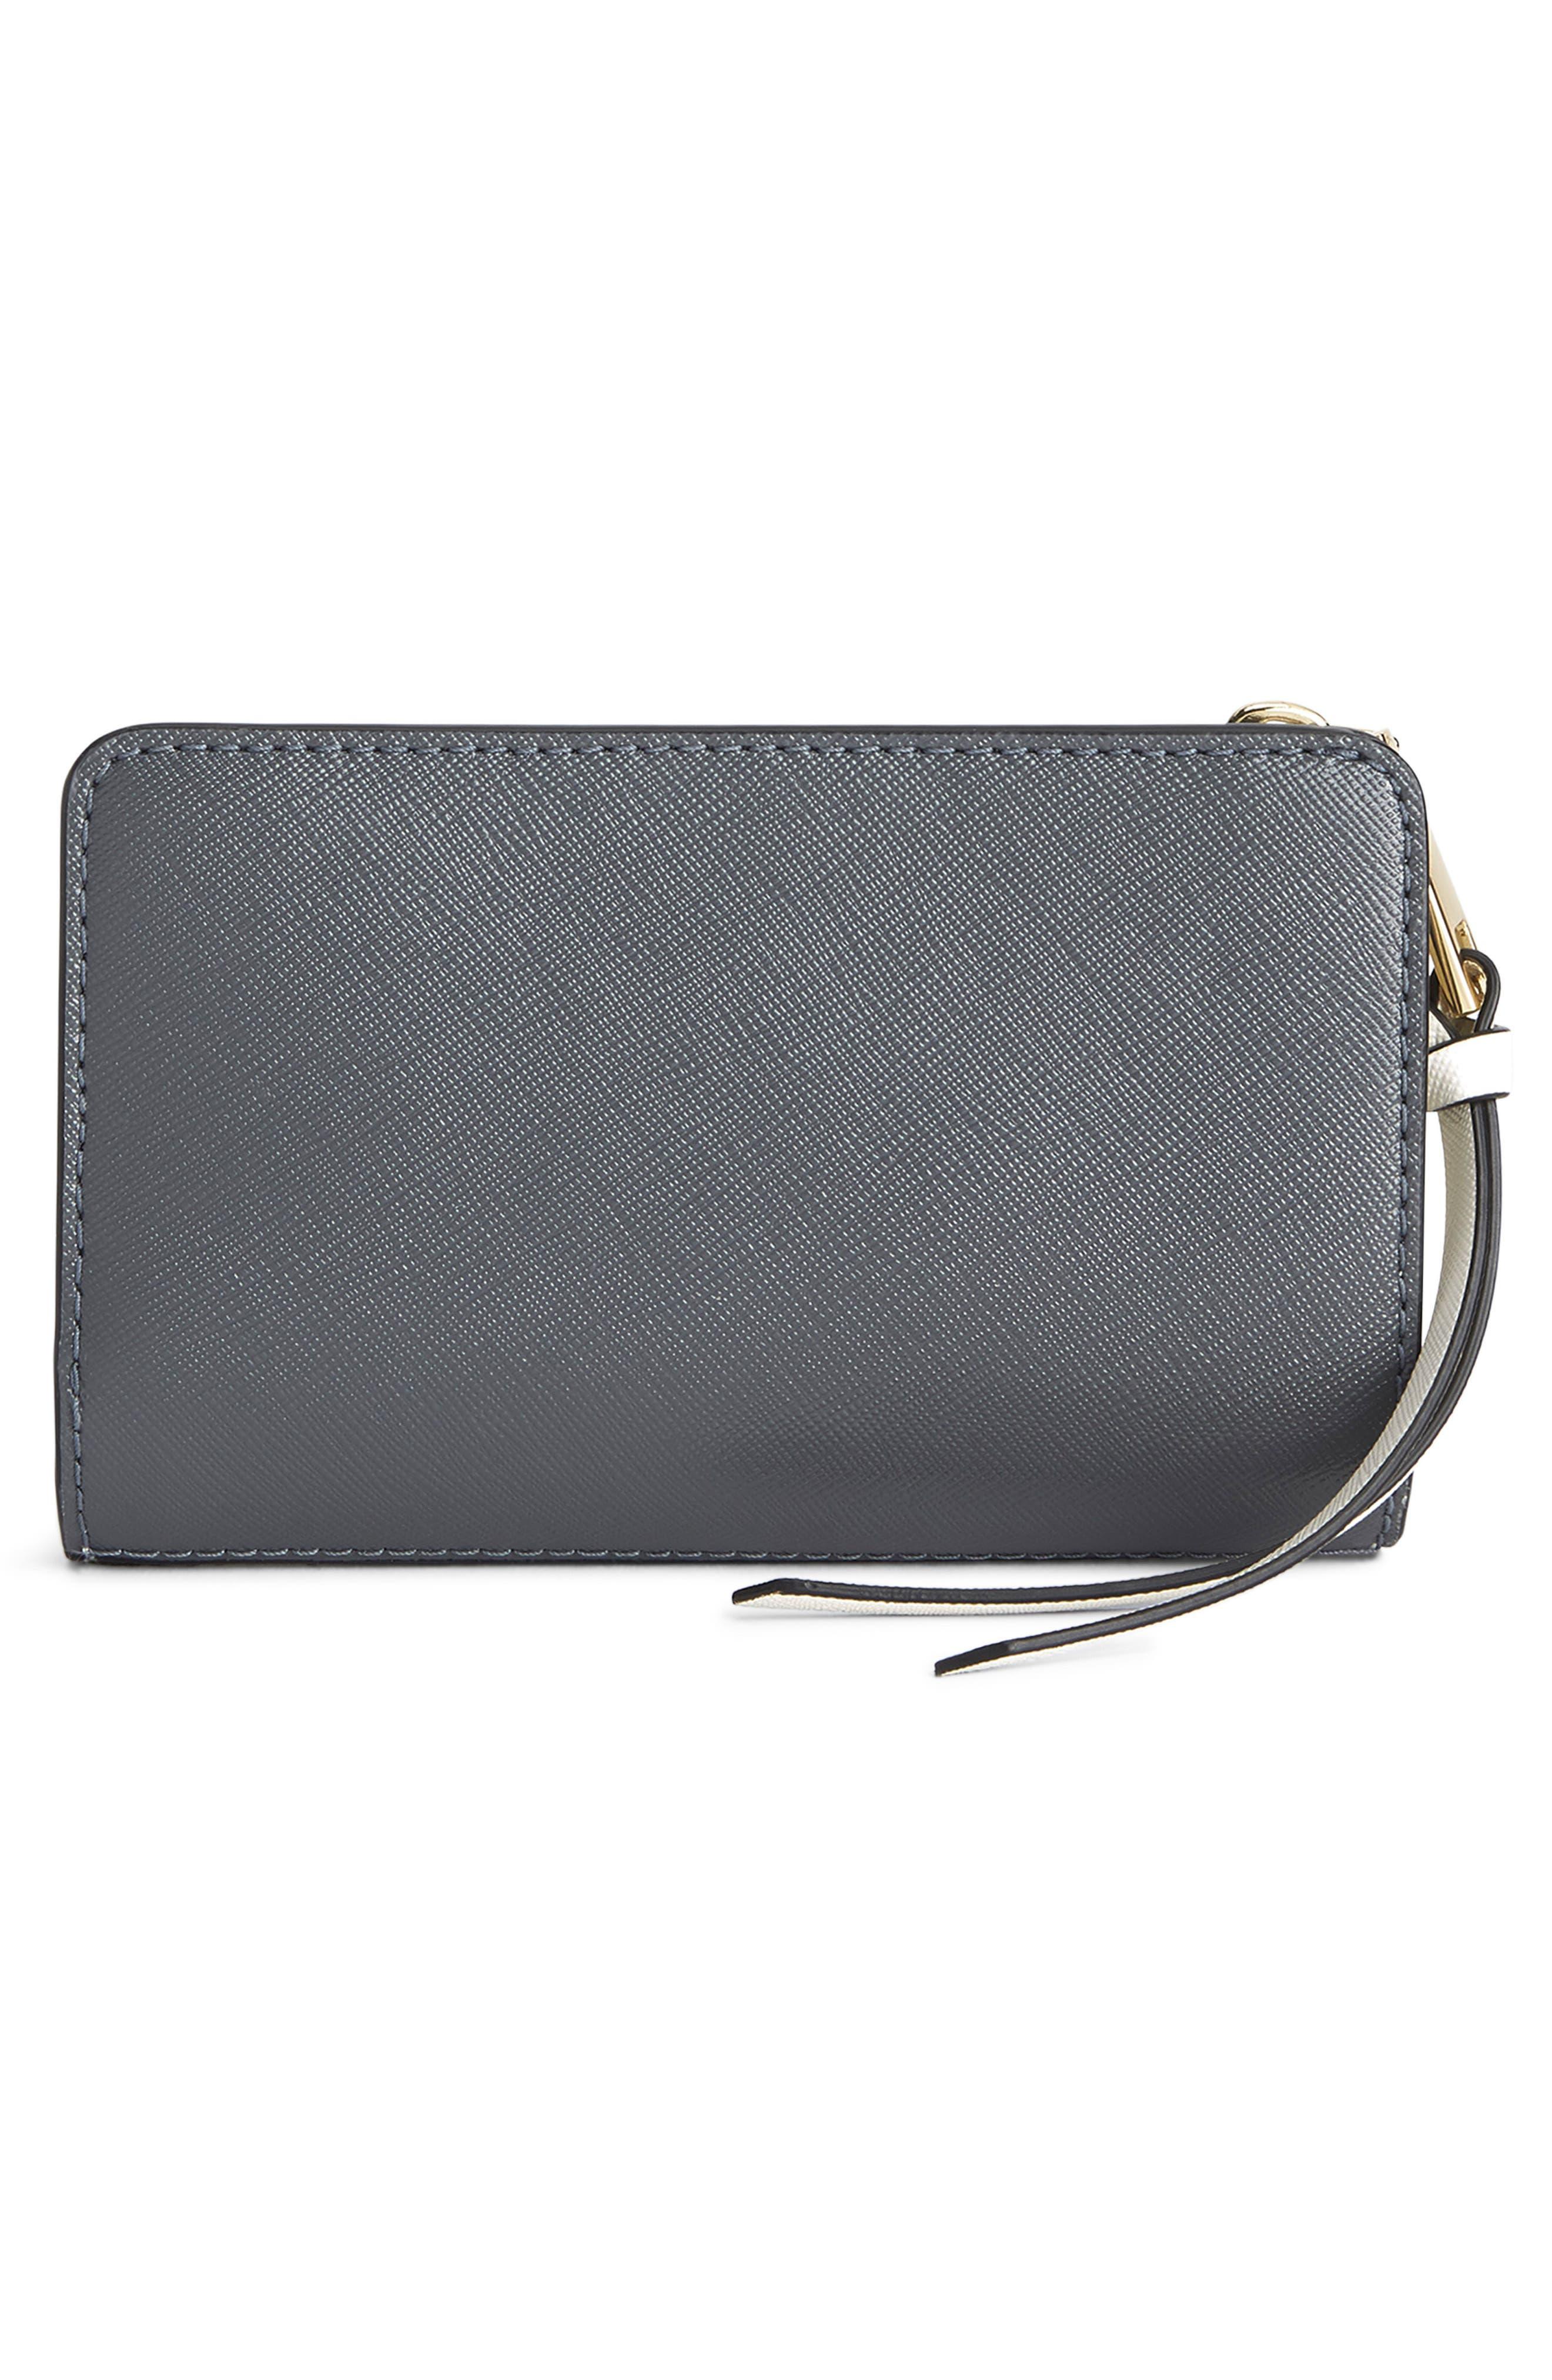 Snapshot Leather Compact Wallet,                             Alternate thumbnail 3, color,                             BLACK MULTI